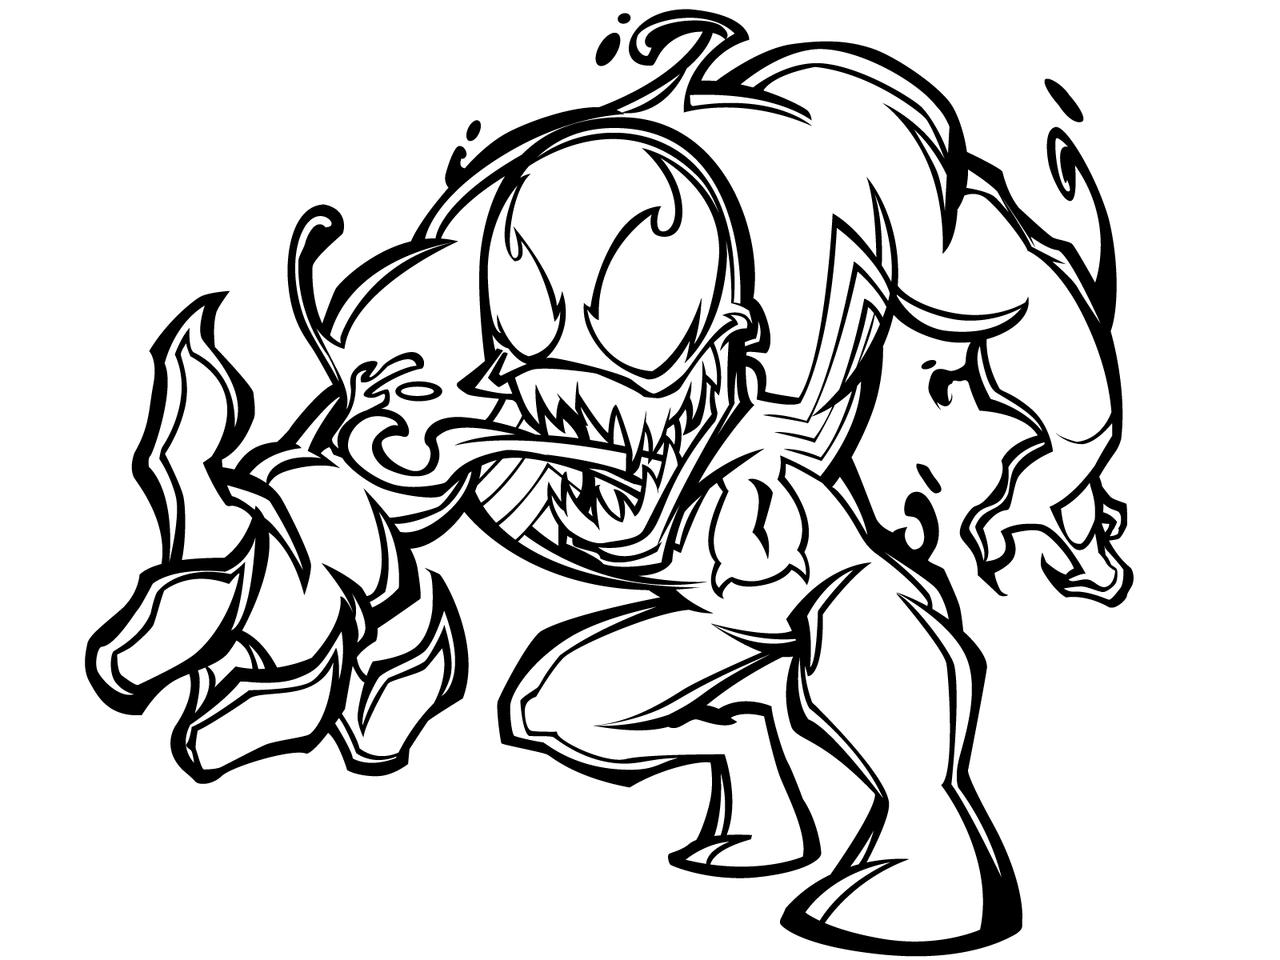 Greatlp S Chibi Venom Inks By Sircle Png 1280 960 Paginas